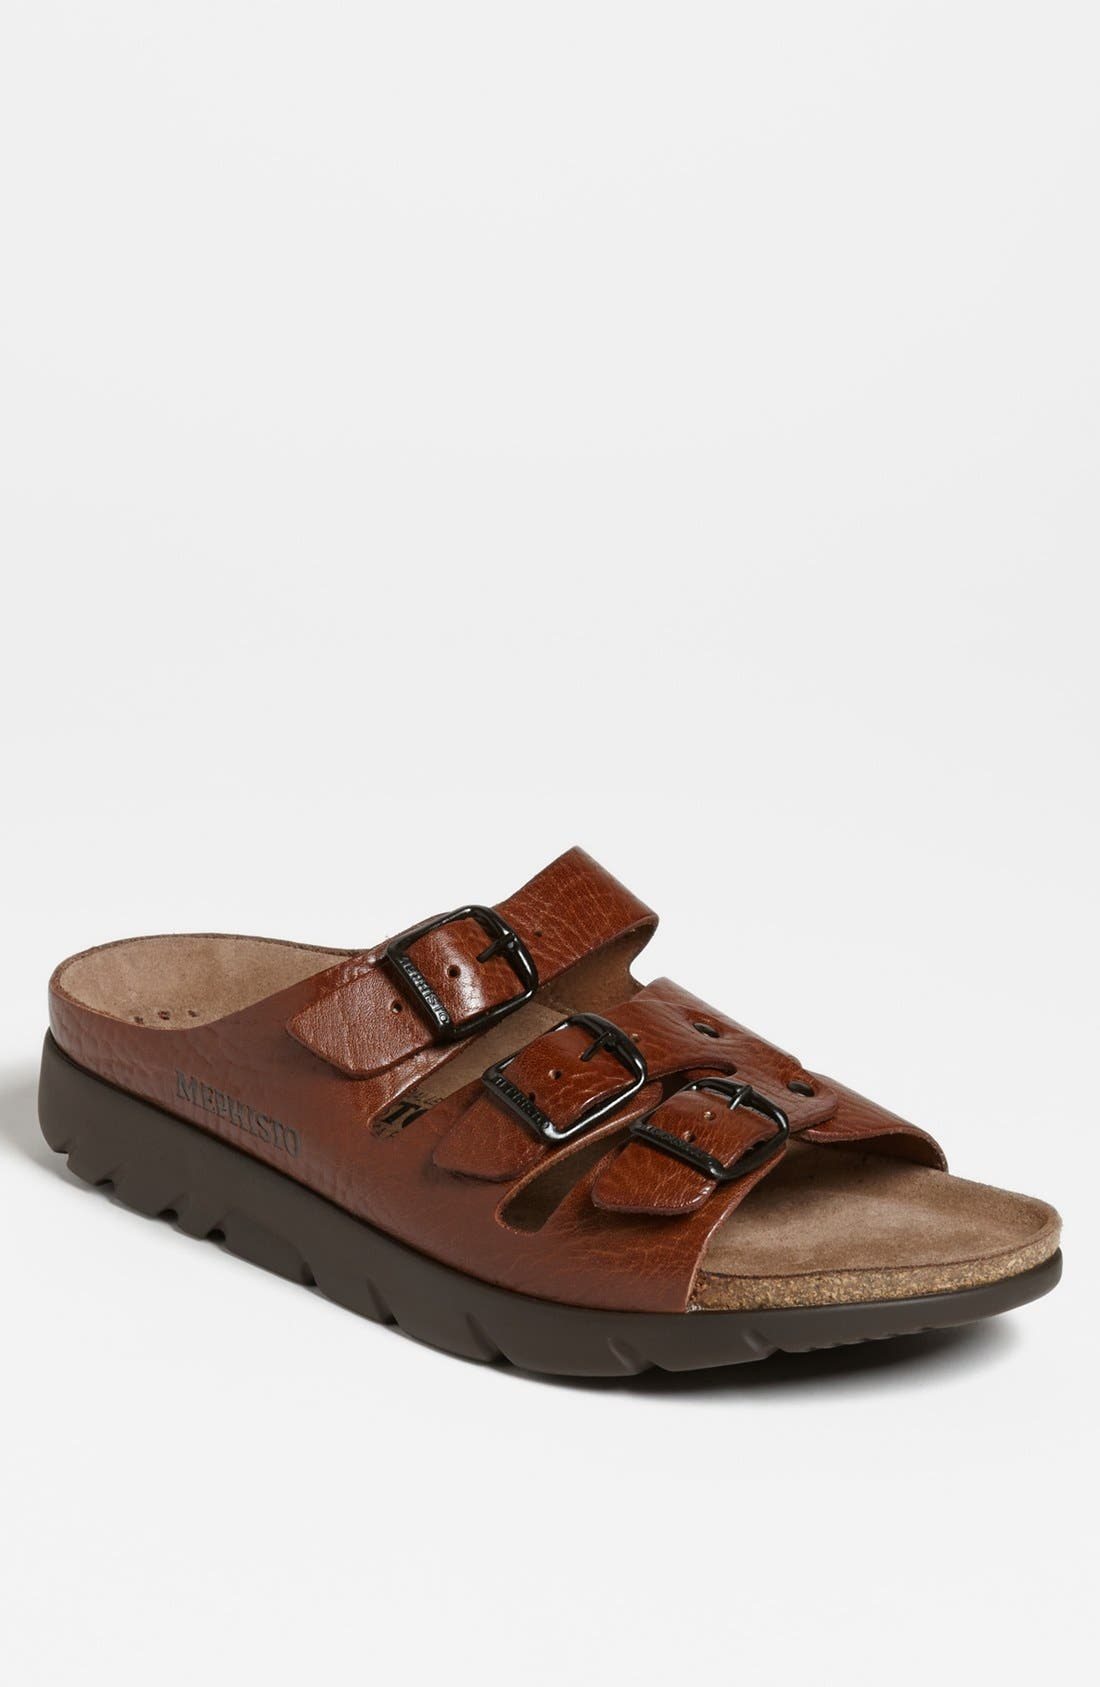 'Zach 3' Sandal,                         Main,                         color, Tan Grain